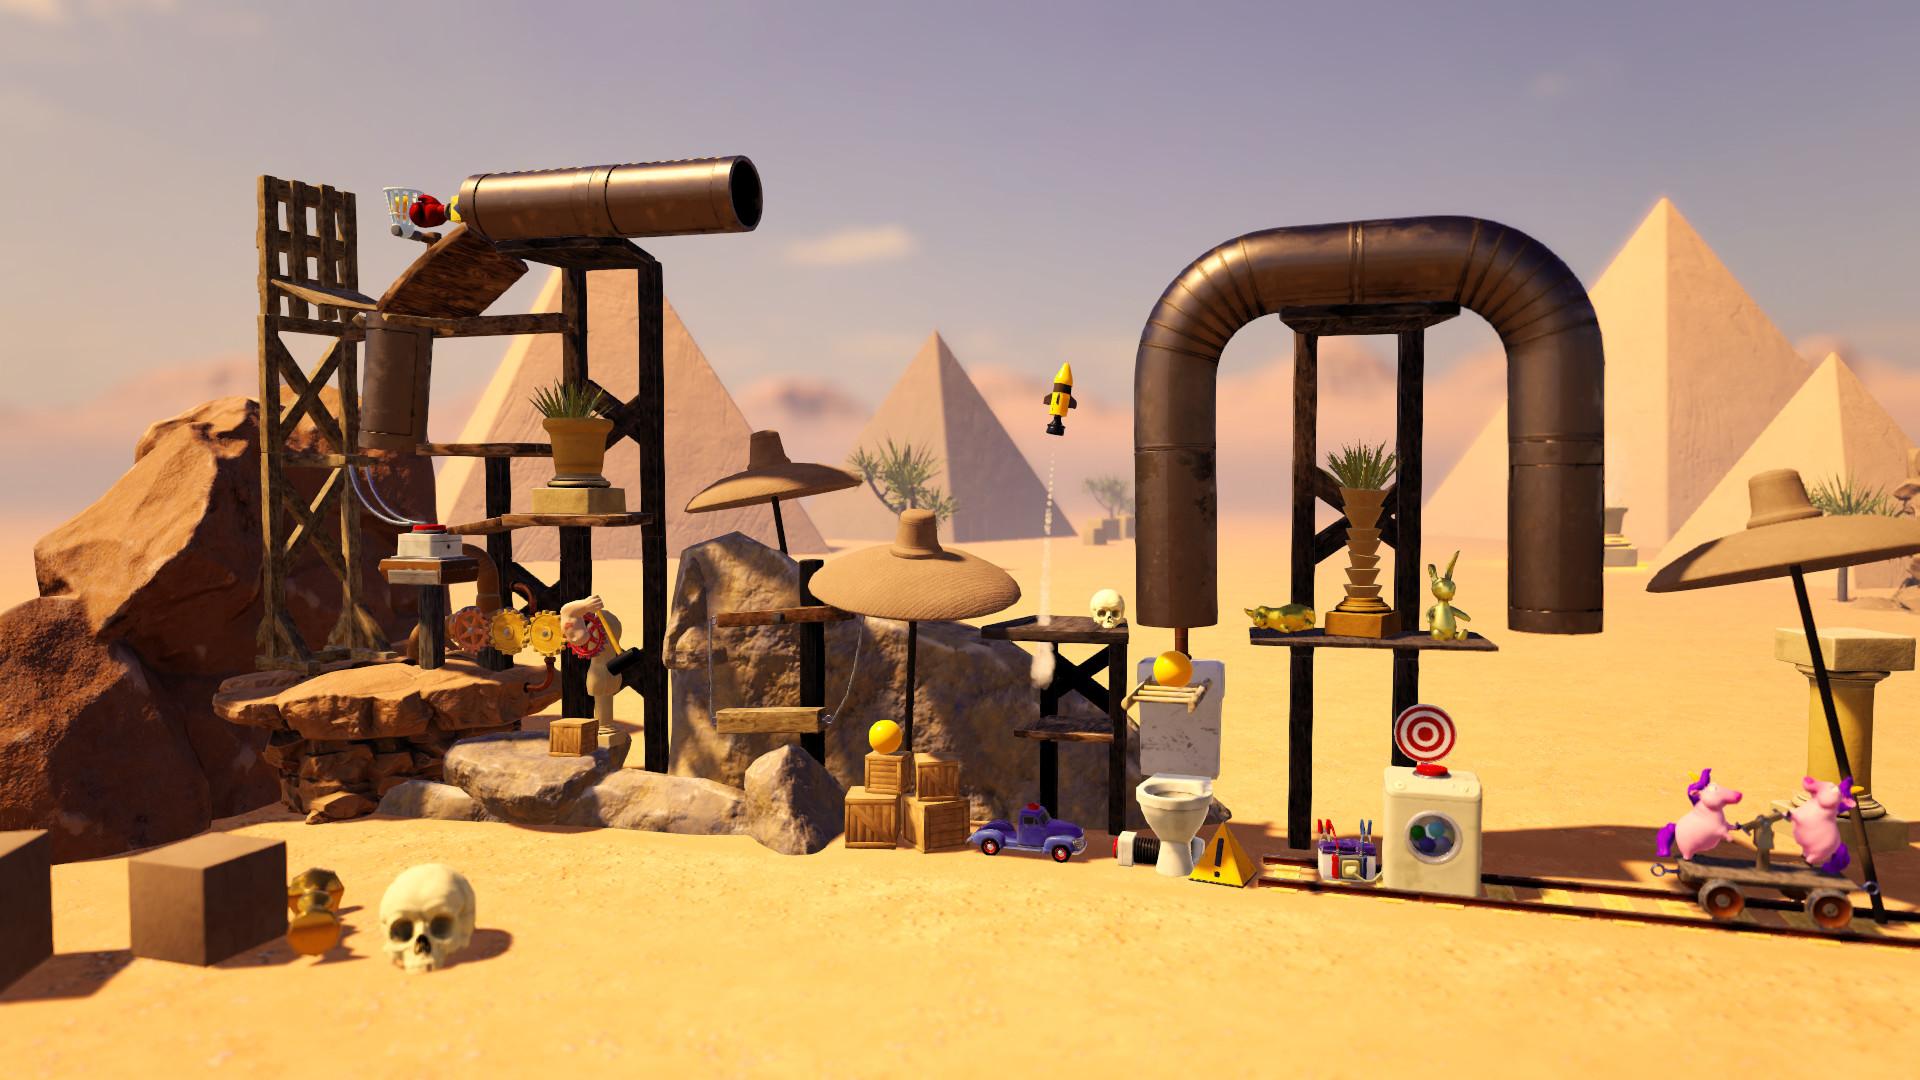 Crazy Machines 3 Screenshot 1